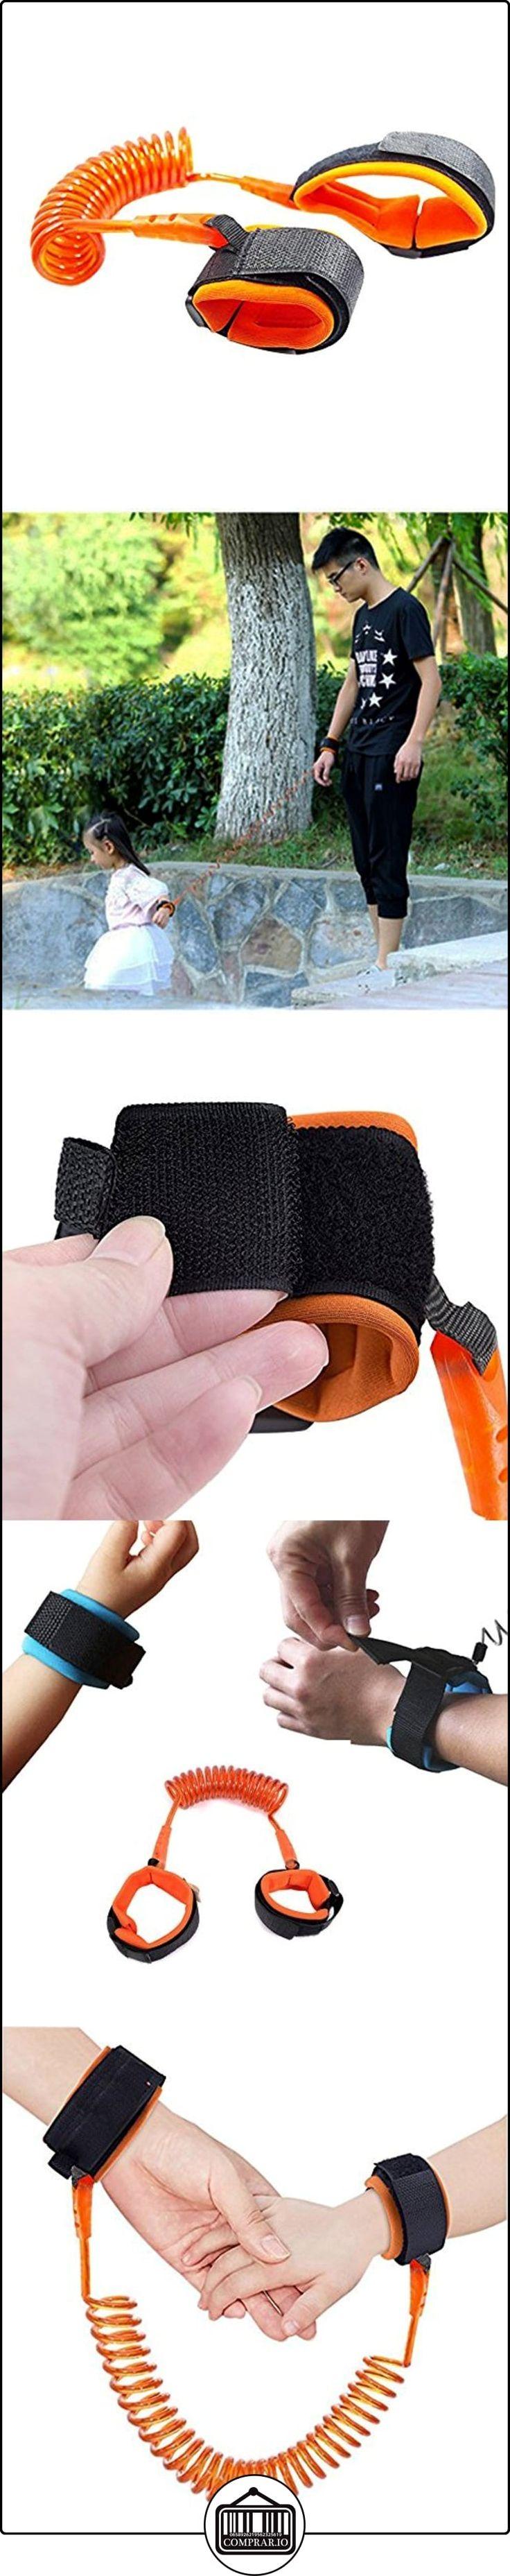 Yakamoz arnés de seguridad para niños anti perdido Wristband Strap muñecas correa cinturón de seguridad para niños cinturón de mano (Marchant para bebés bebé niños  ✿ Seguridad para tu bebé - (Protege a tus hijos) ✿ ▬► Ver oferta: http://comprar.io/goto/B01MQZ8XBH